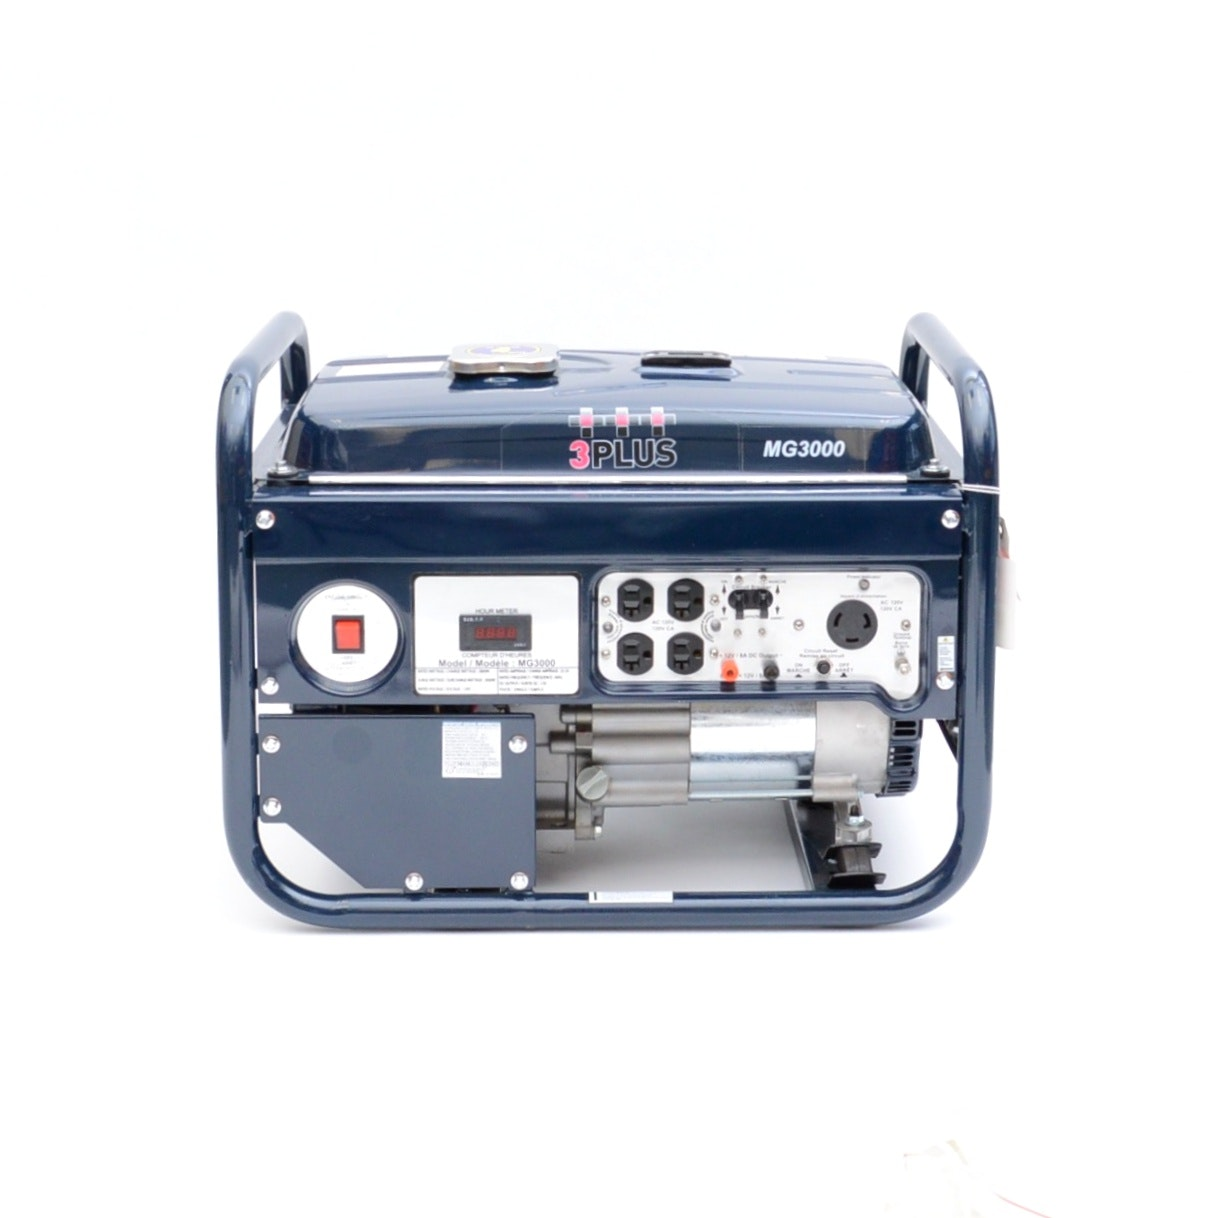 3 PLUS MG 3000 Generator